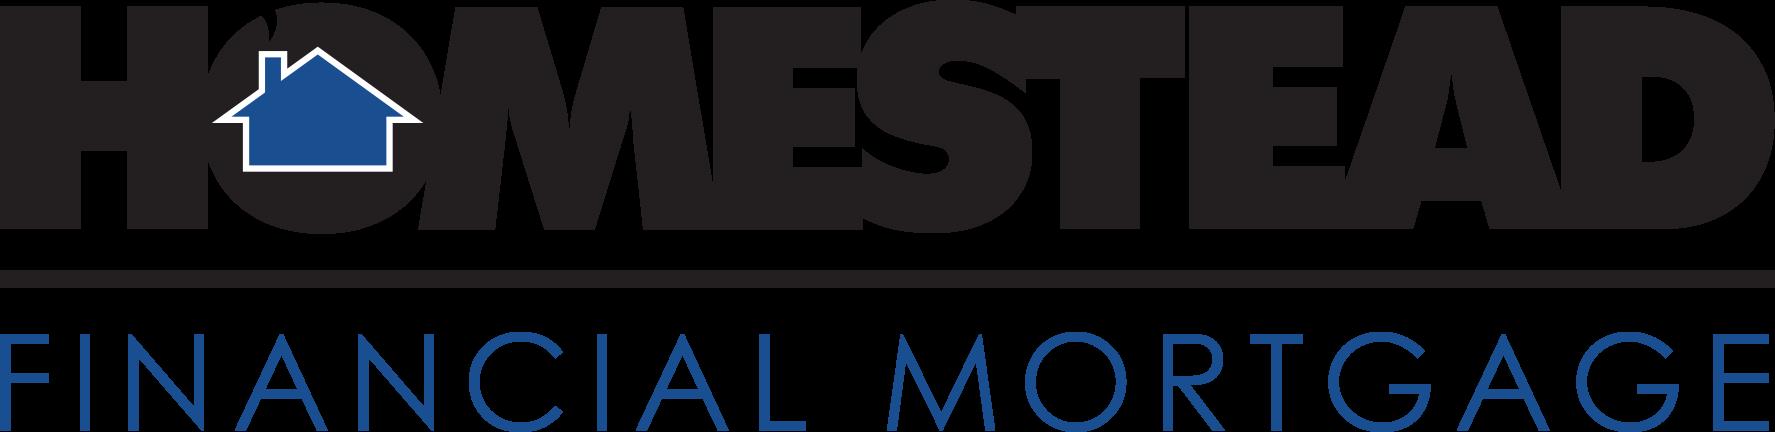 Homestead Financial Mortgage ( HFM)